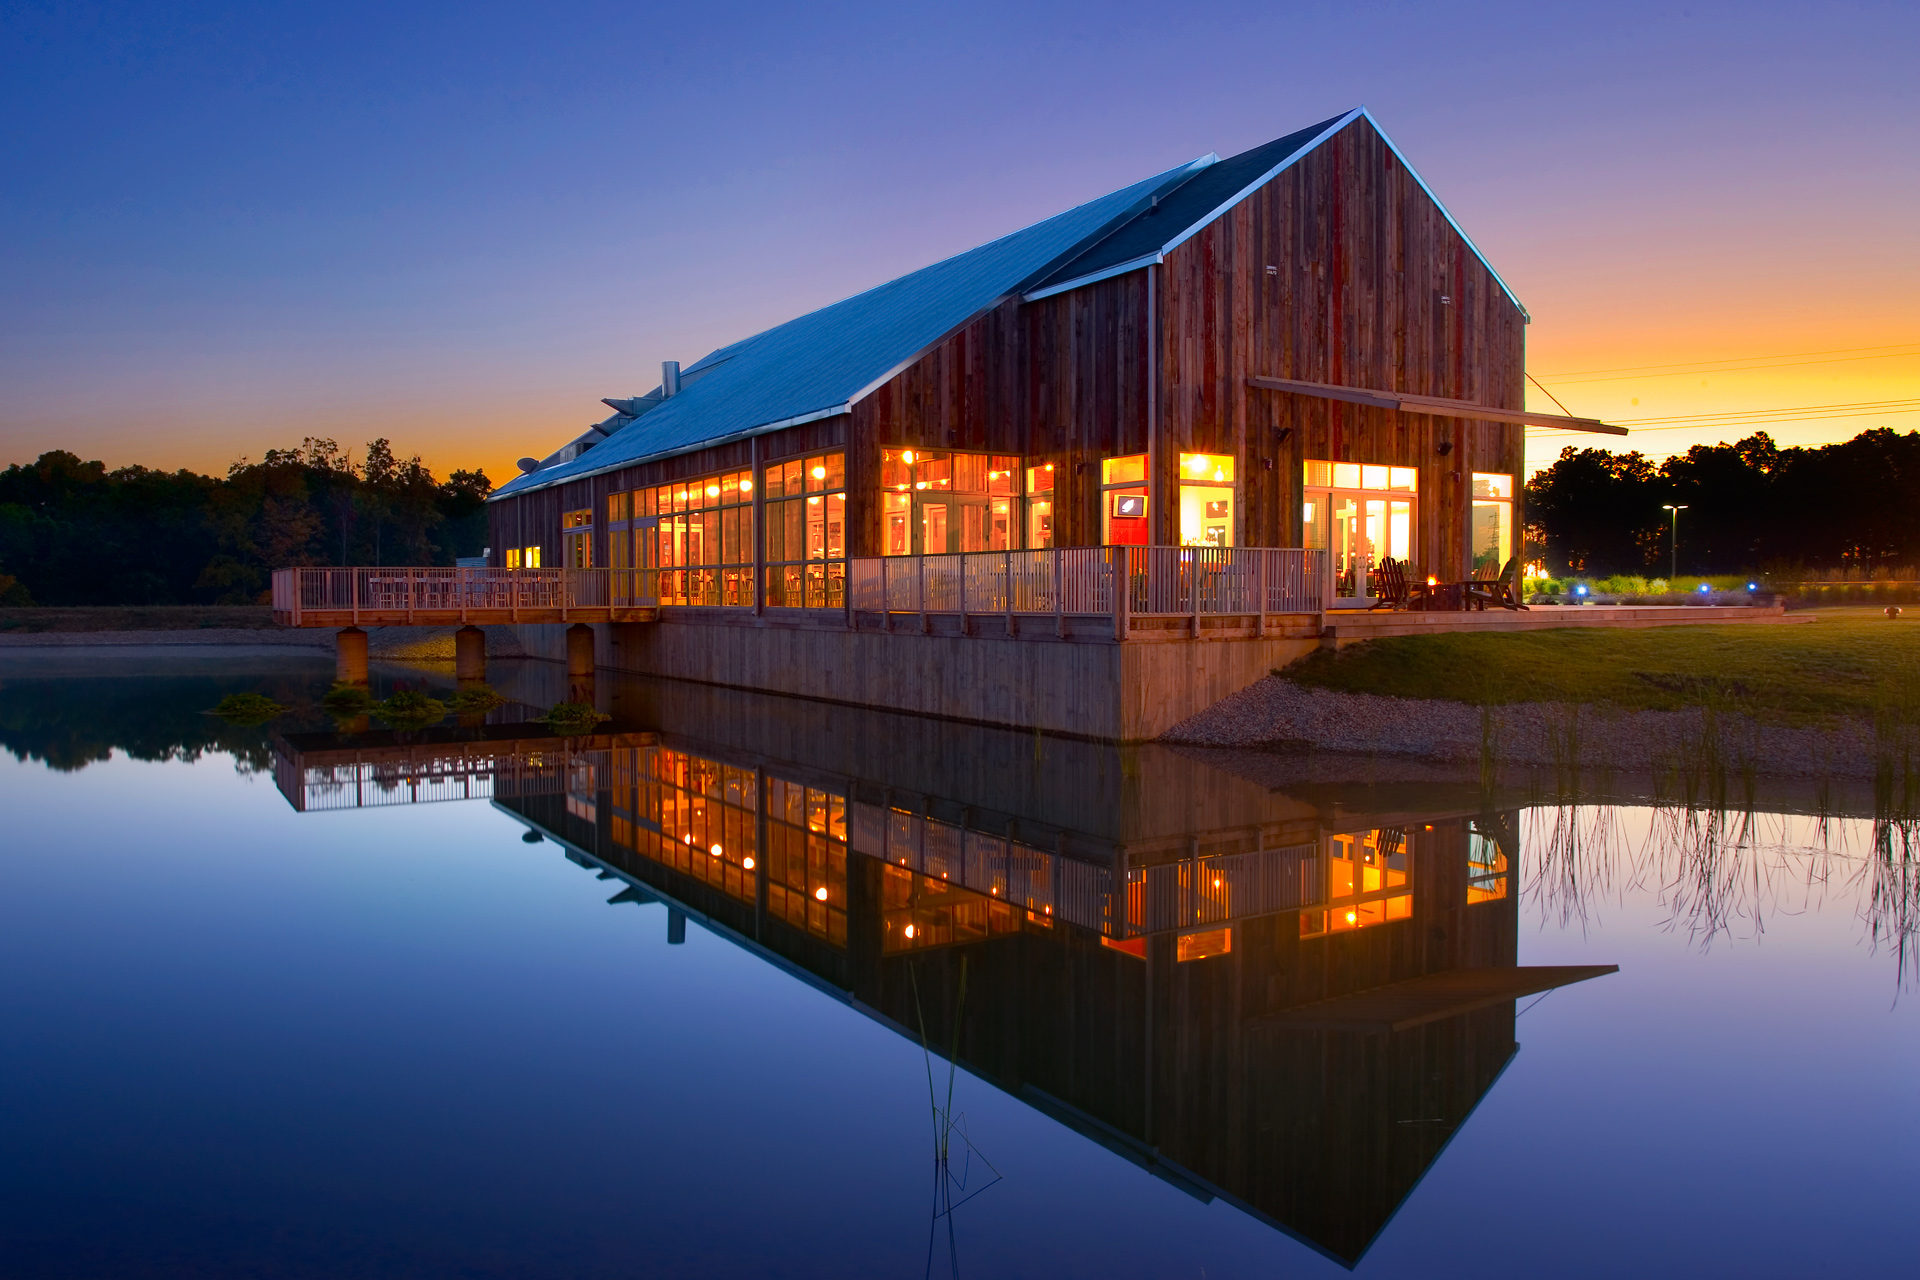 Firefly Grill restaurant home design ideas